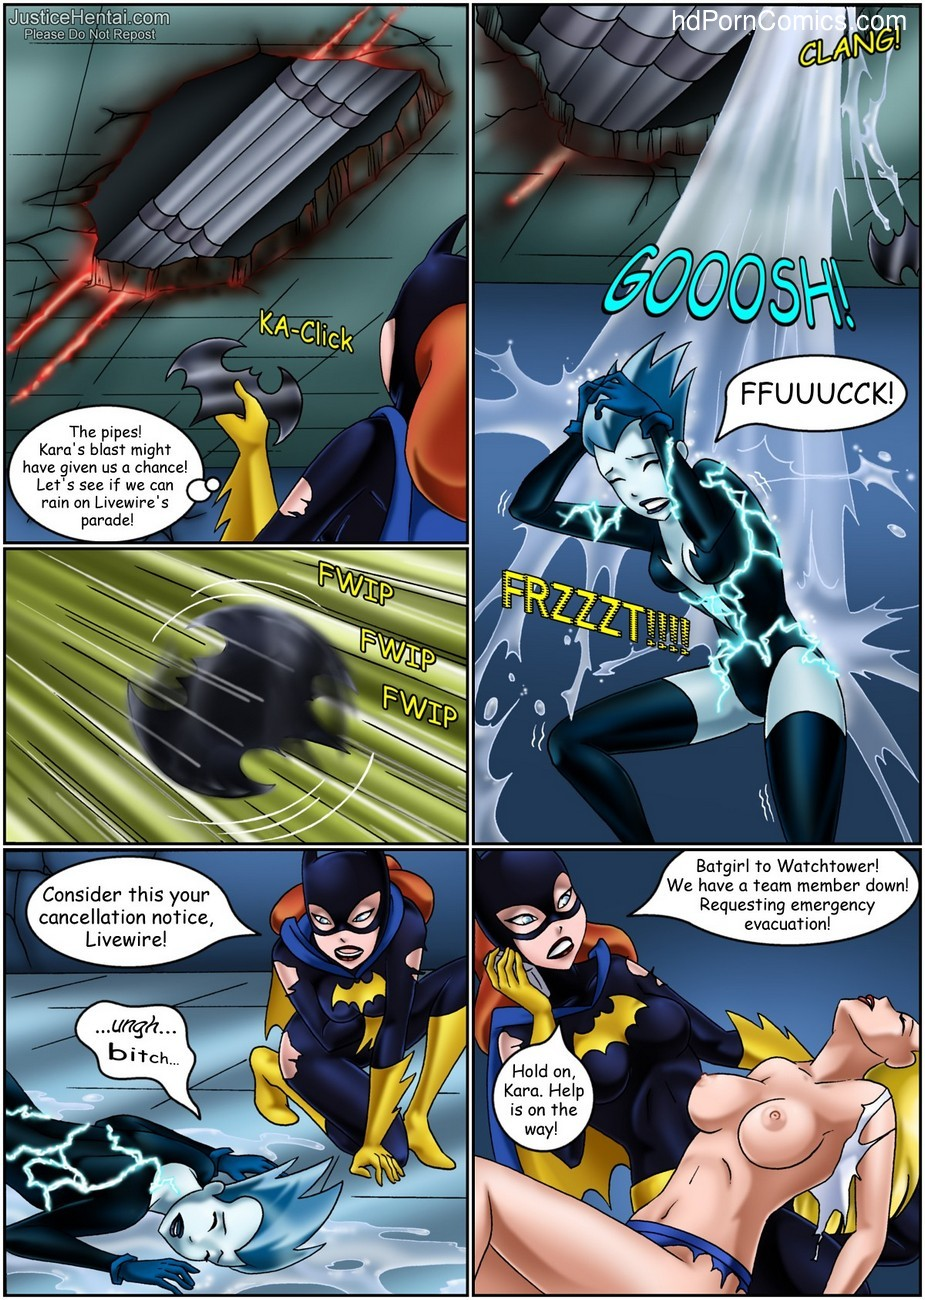 Justice Hentai 4 27 free sex comic